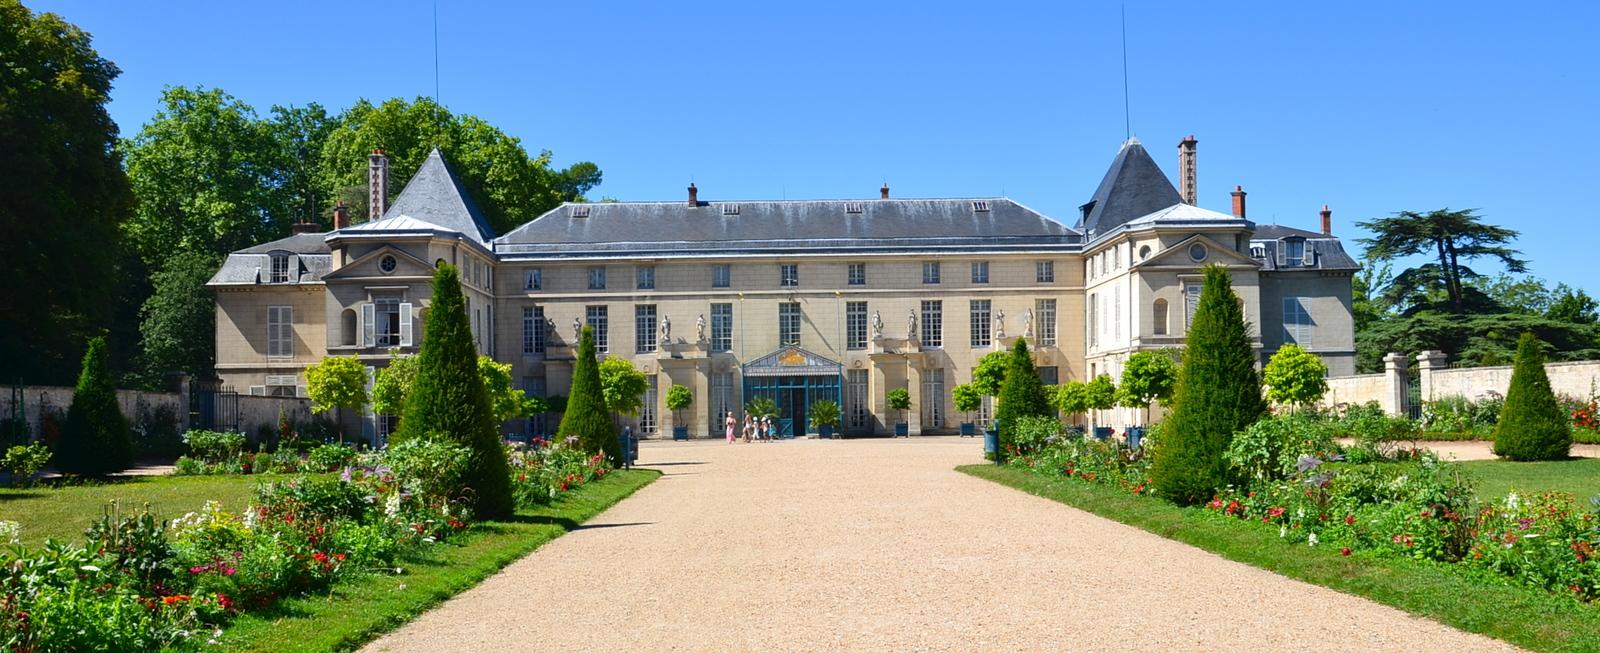 Façade du château de Malmaison%252C Rueil-Malmaison%252C 2013. Office de Tourisme de Rueil-Malmaison